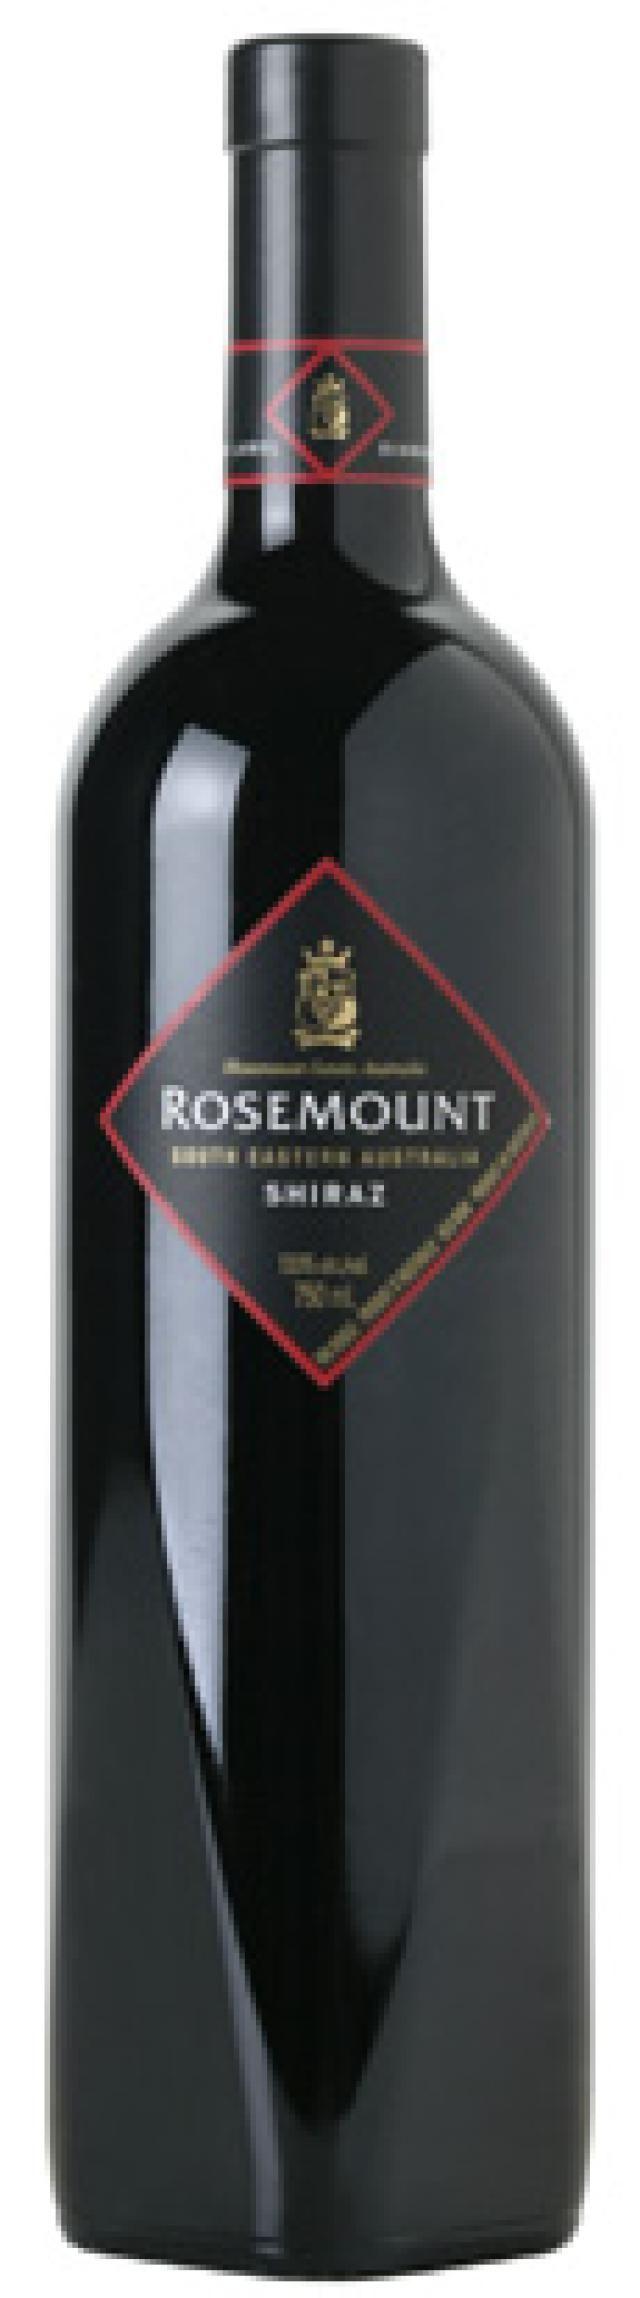 8 Budget-Friendly Shiraz Wines: Rosemount Diamond Series Shiraz (Australia) $9